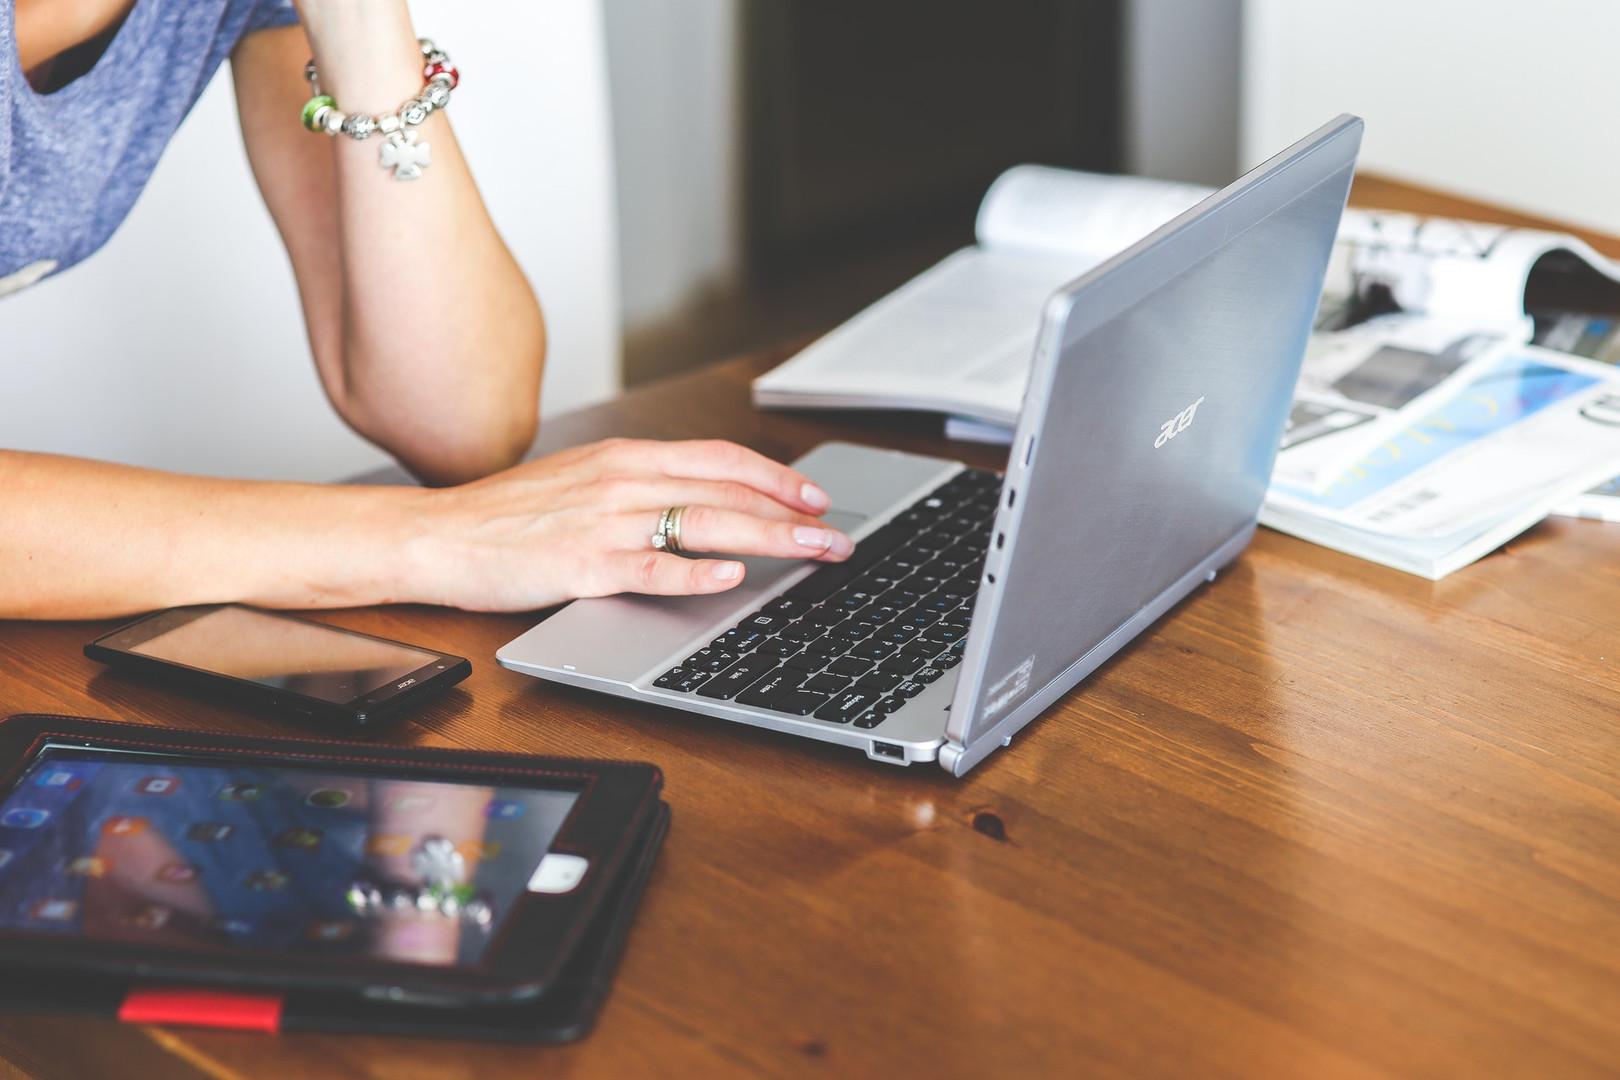 woman-hand-smartphone-laptop.jpg